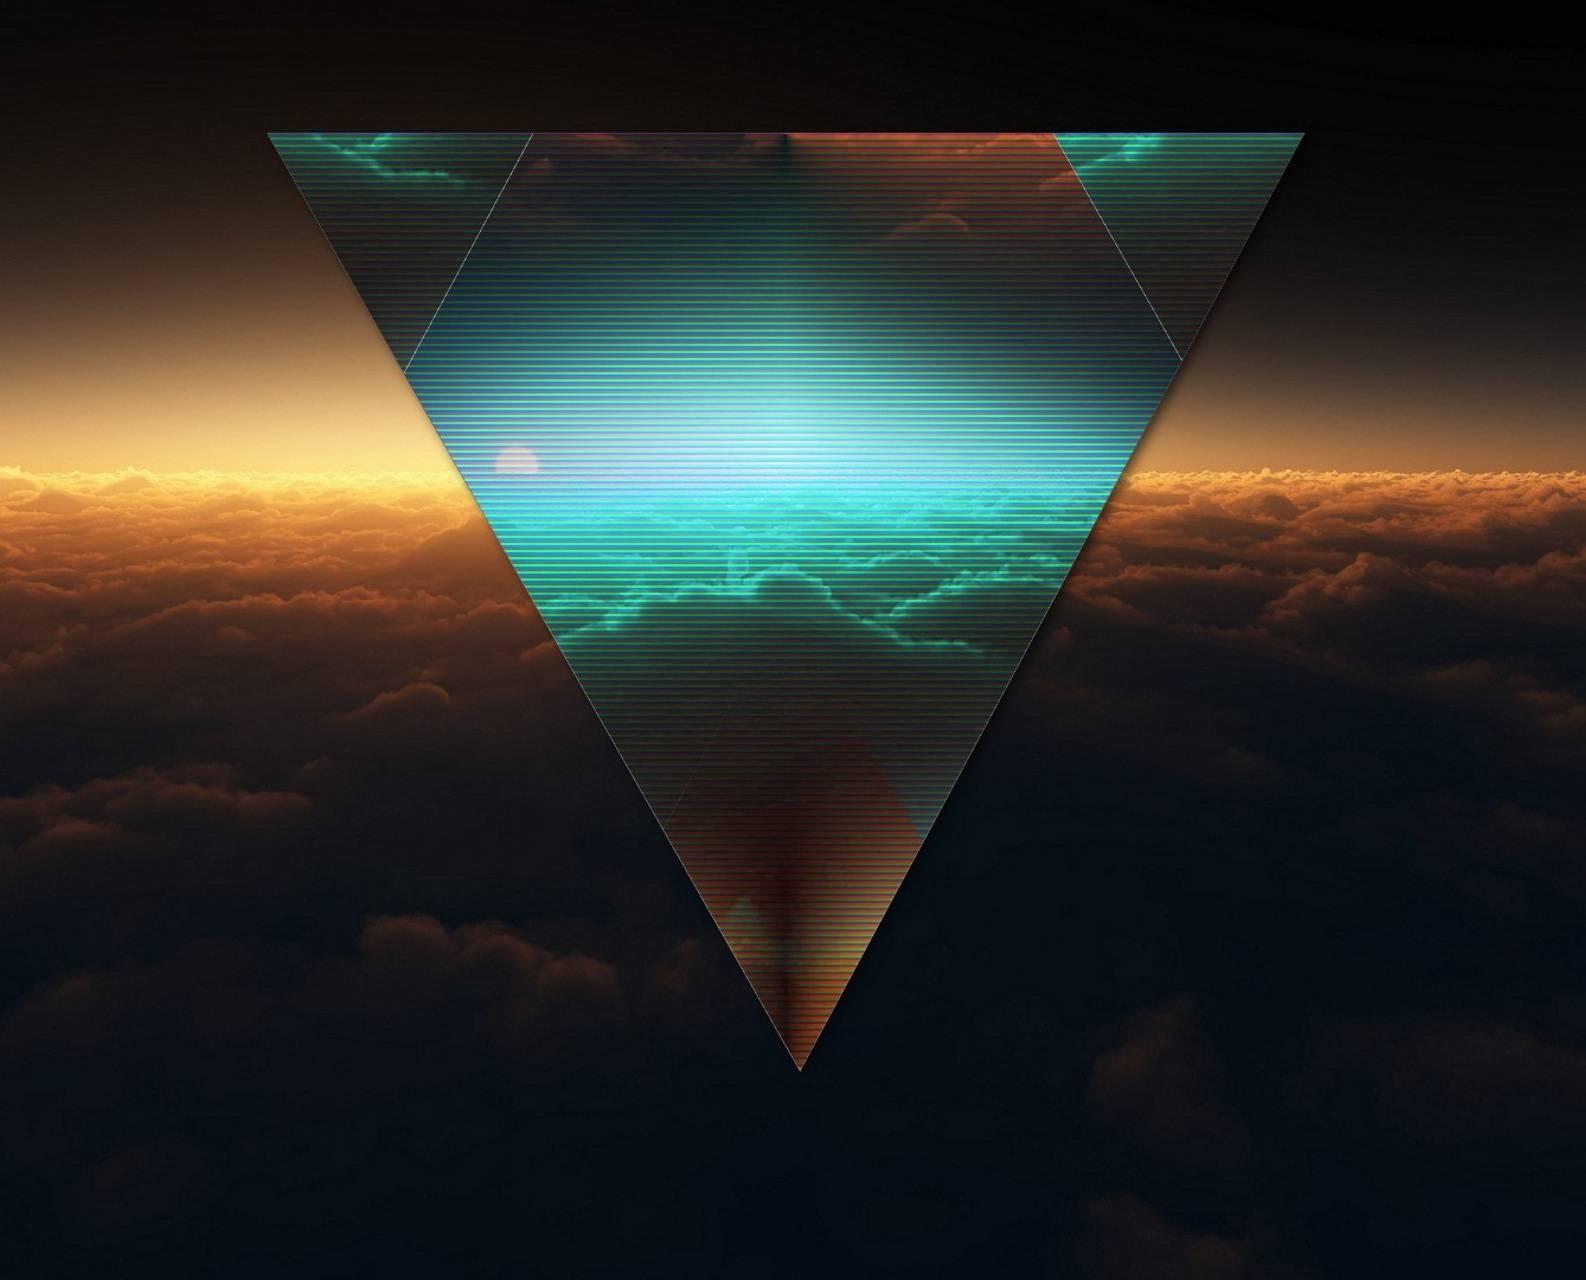 Dark Triangle